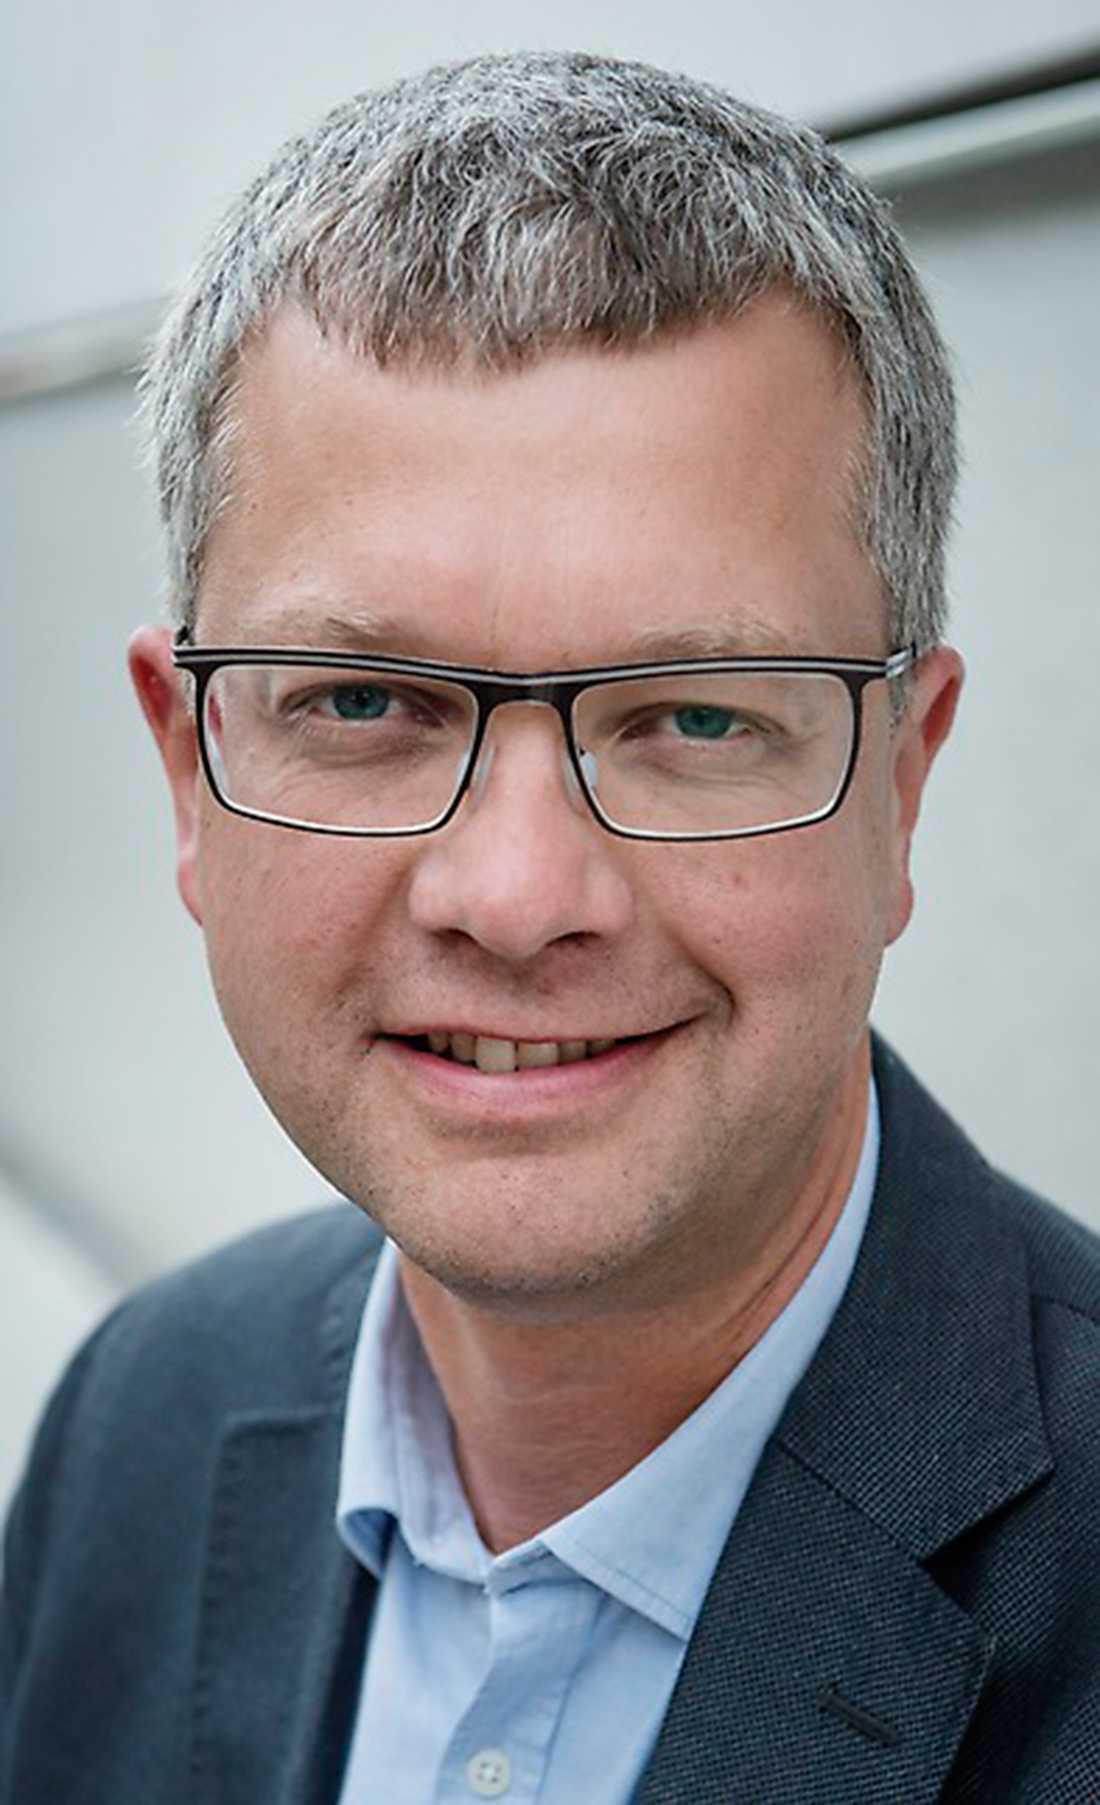 De nya siffrorna har gjort Moderaternas partisekreterare Kent Persson optimistisk.